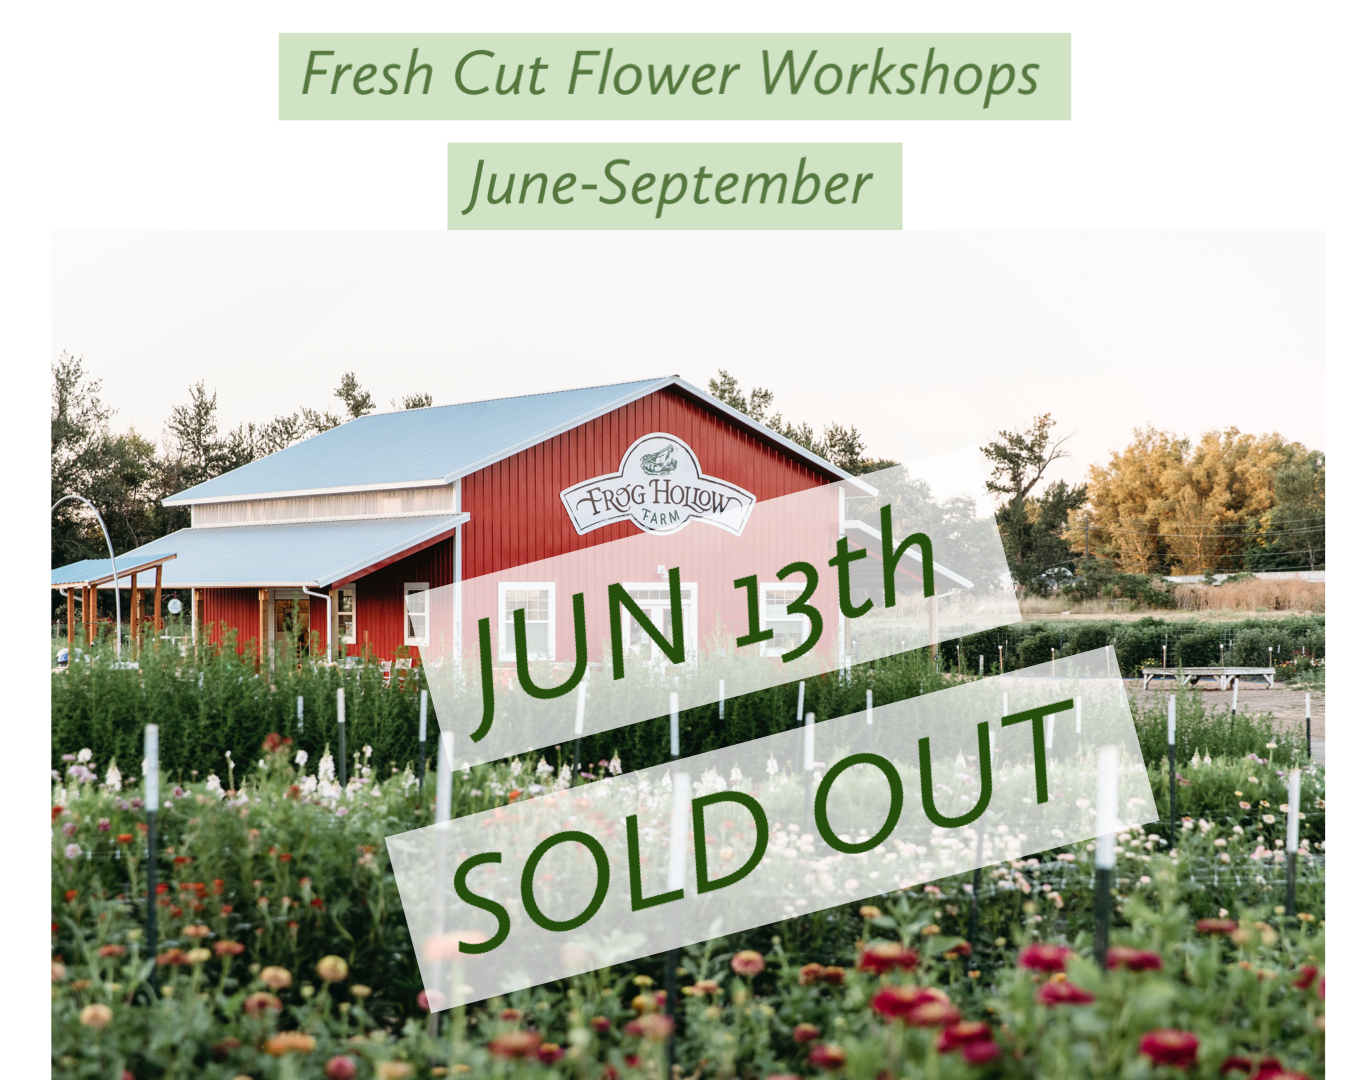 June 13 - Fresh Cut Flower Workshop